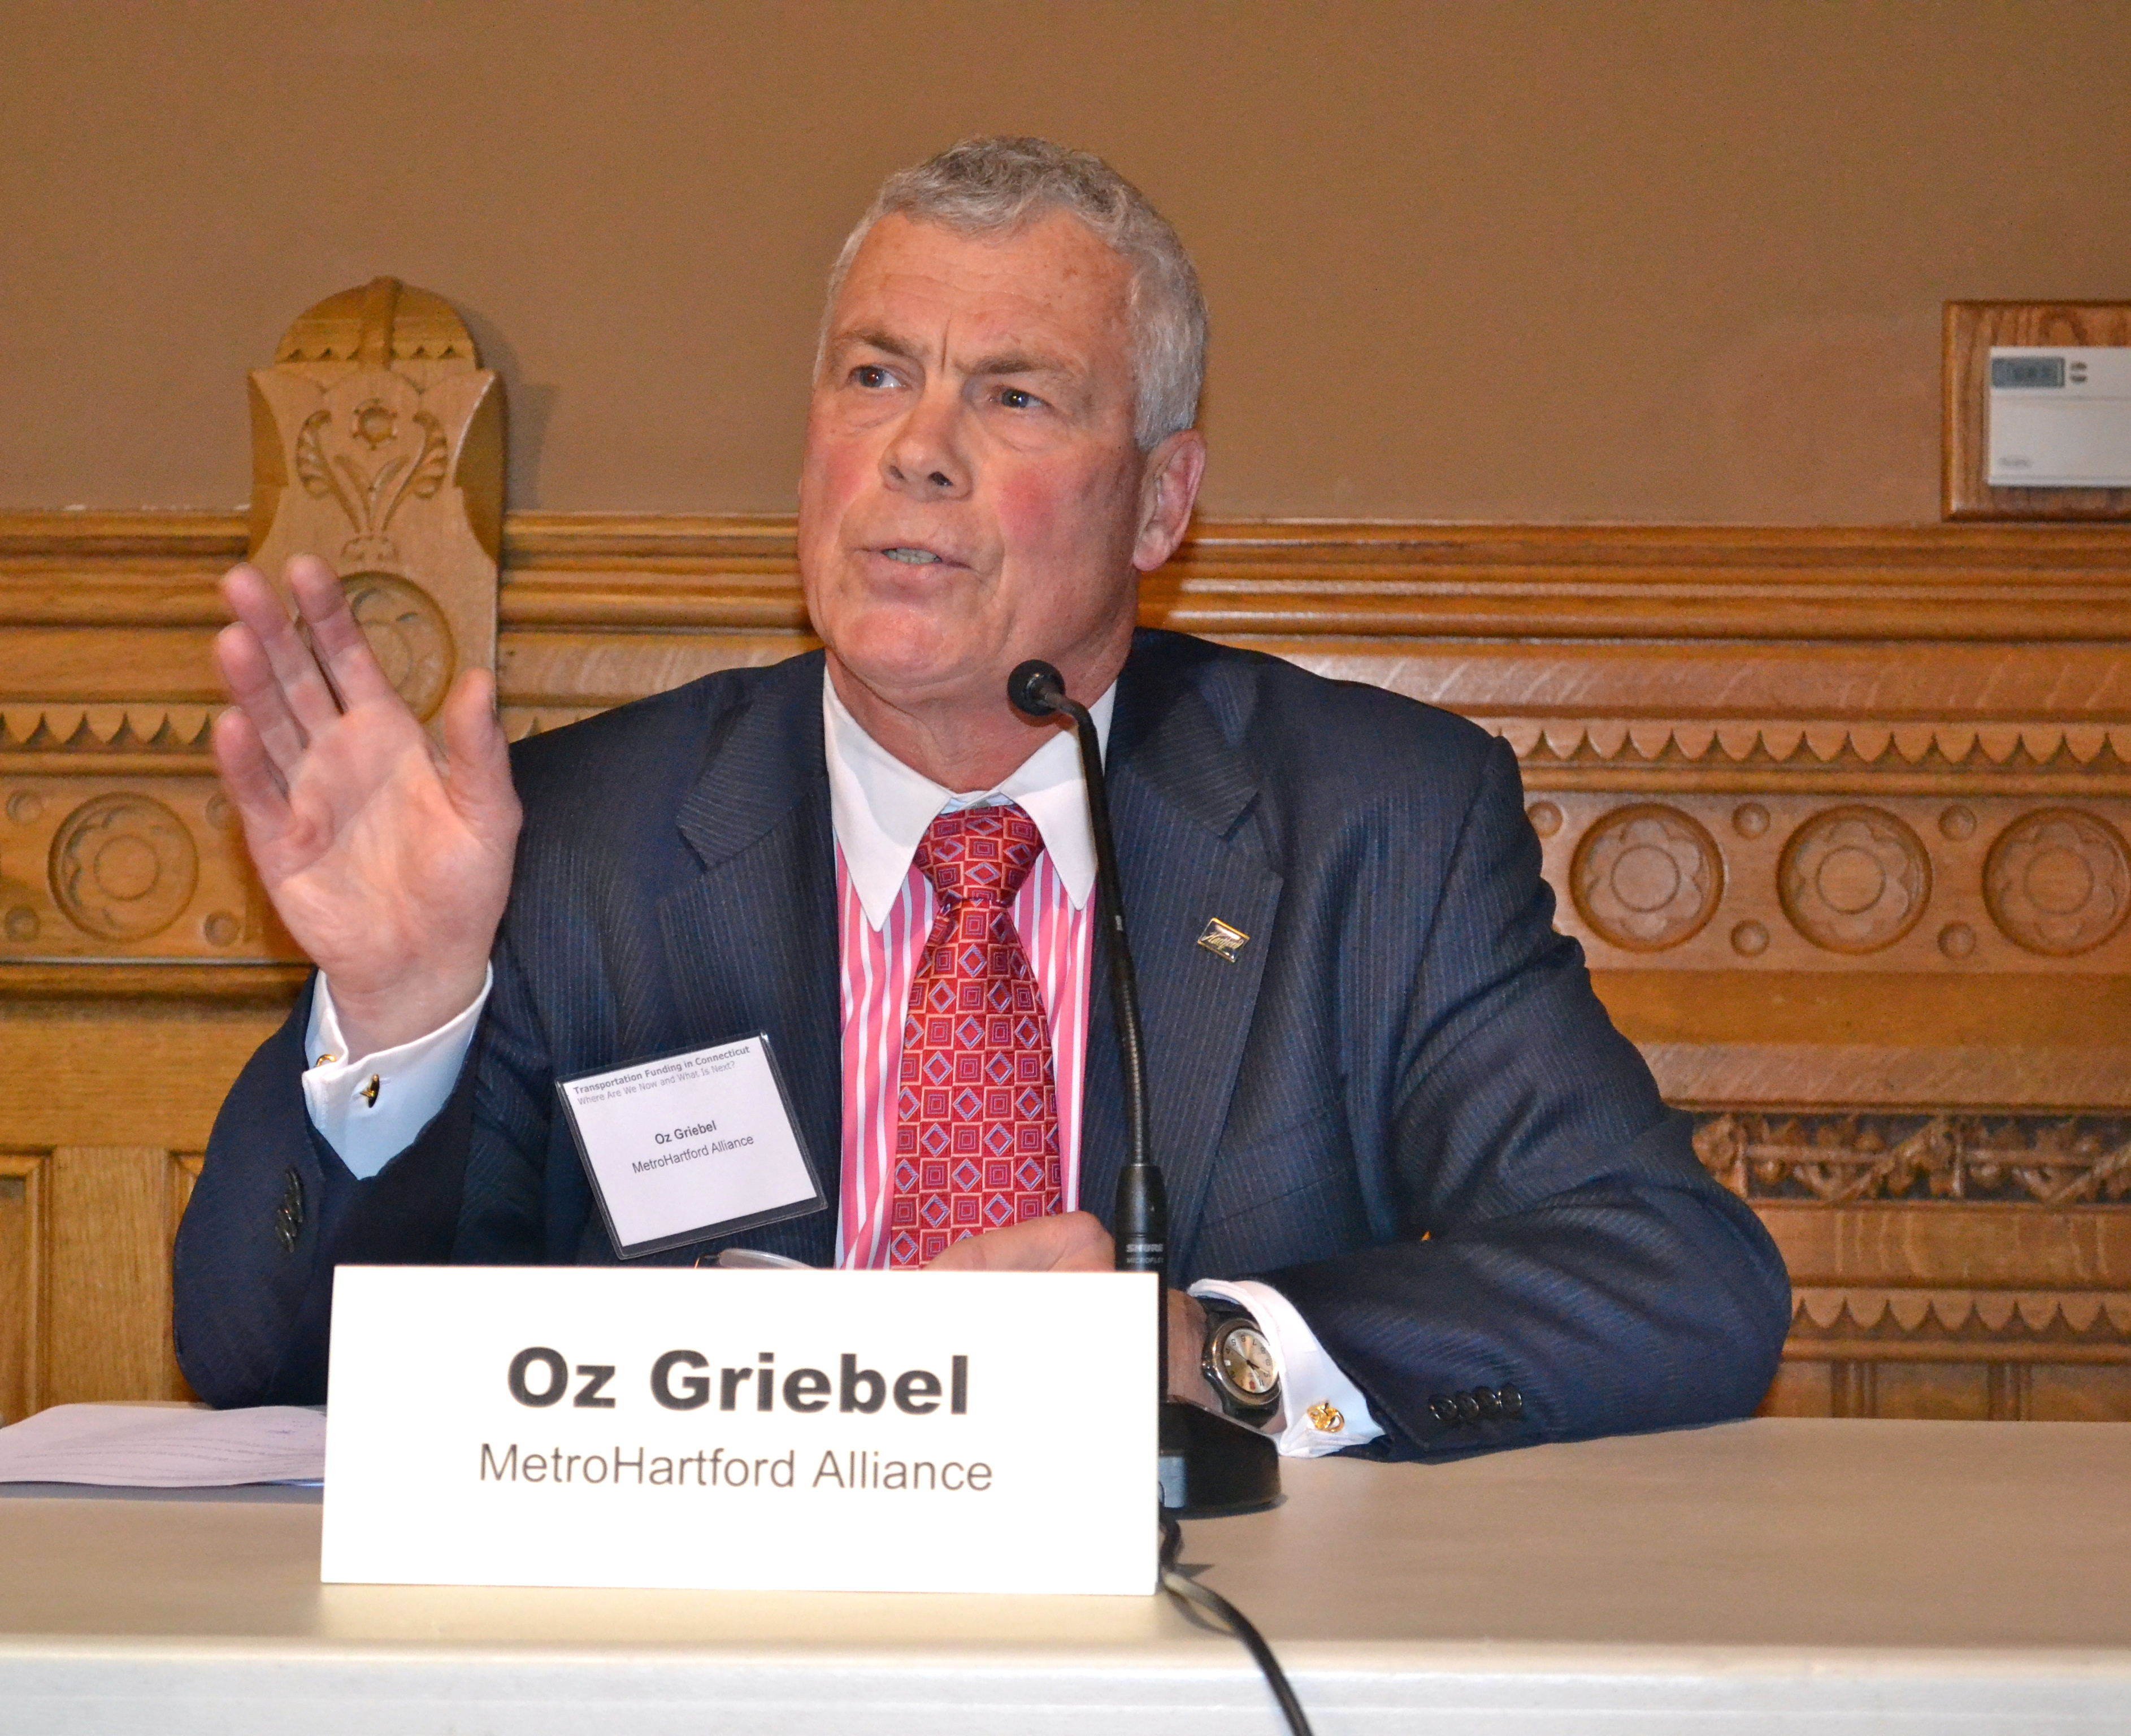 Oz Griebel of the MetroHartford Alliance